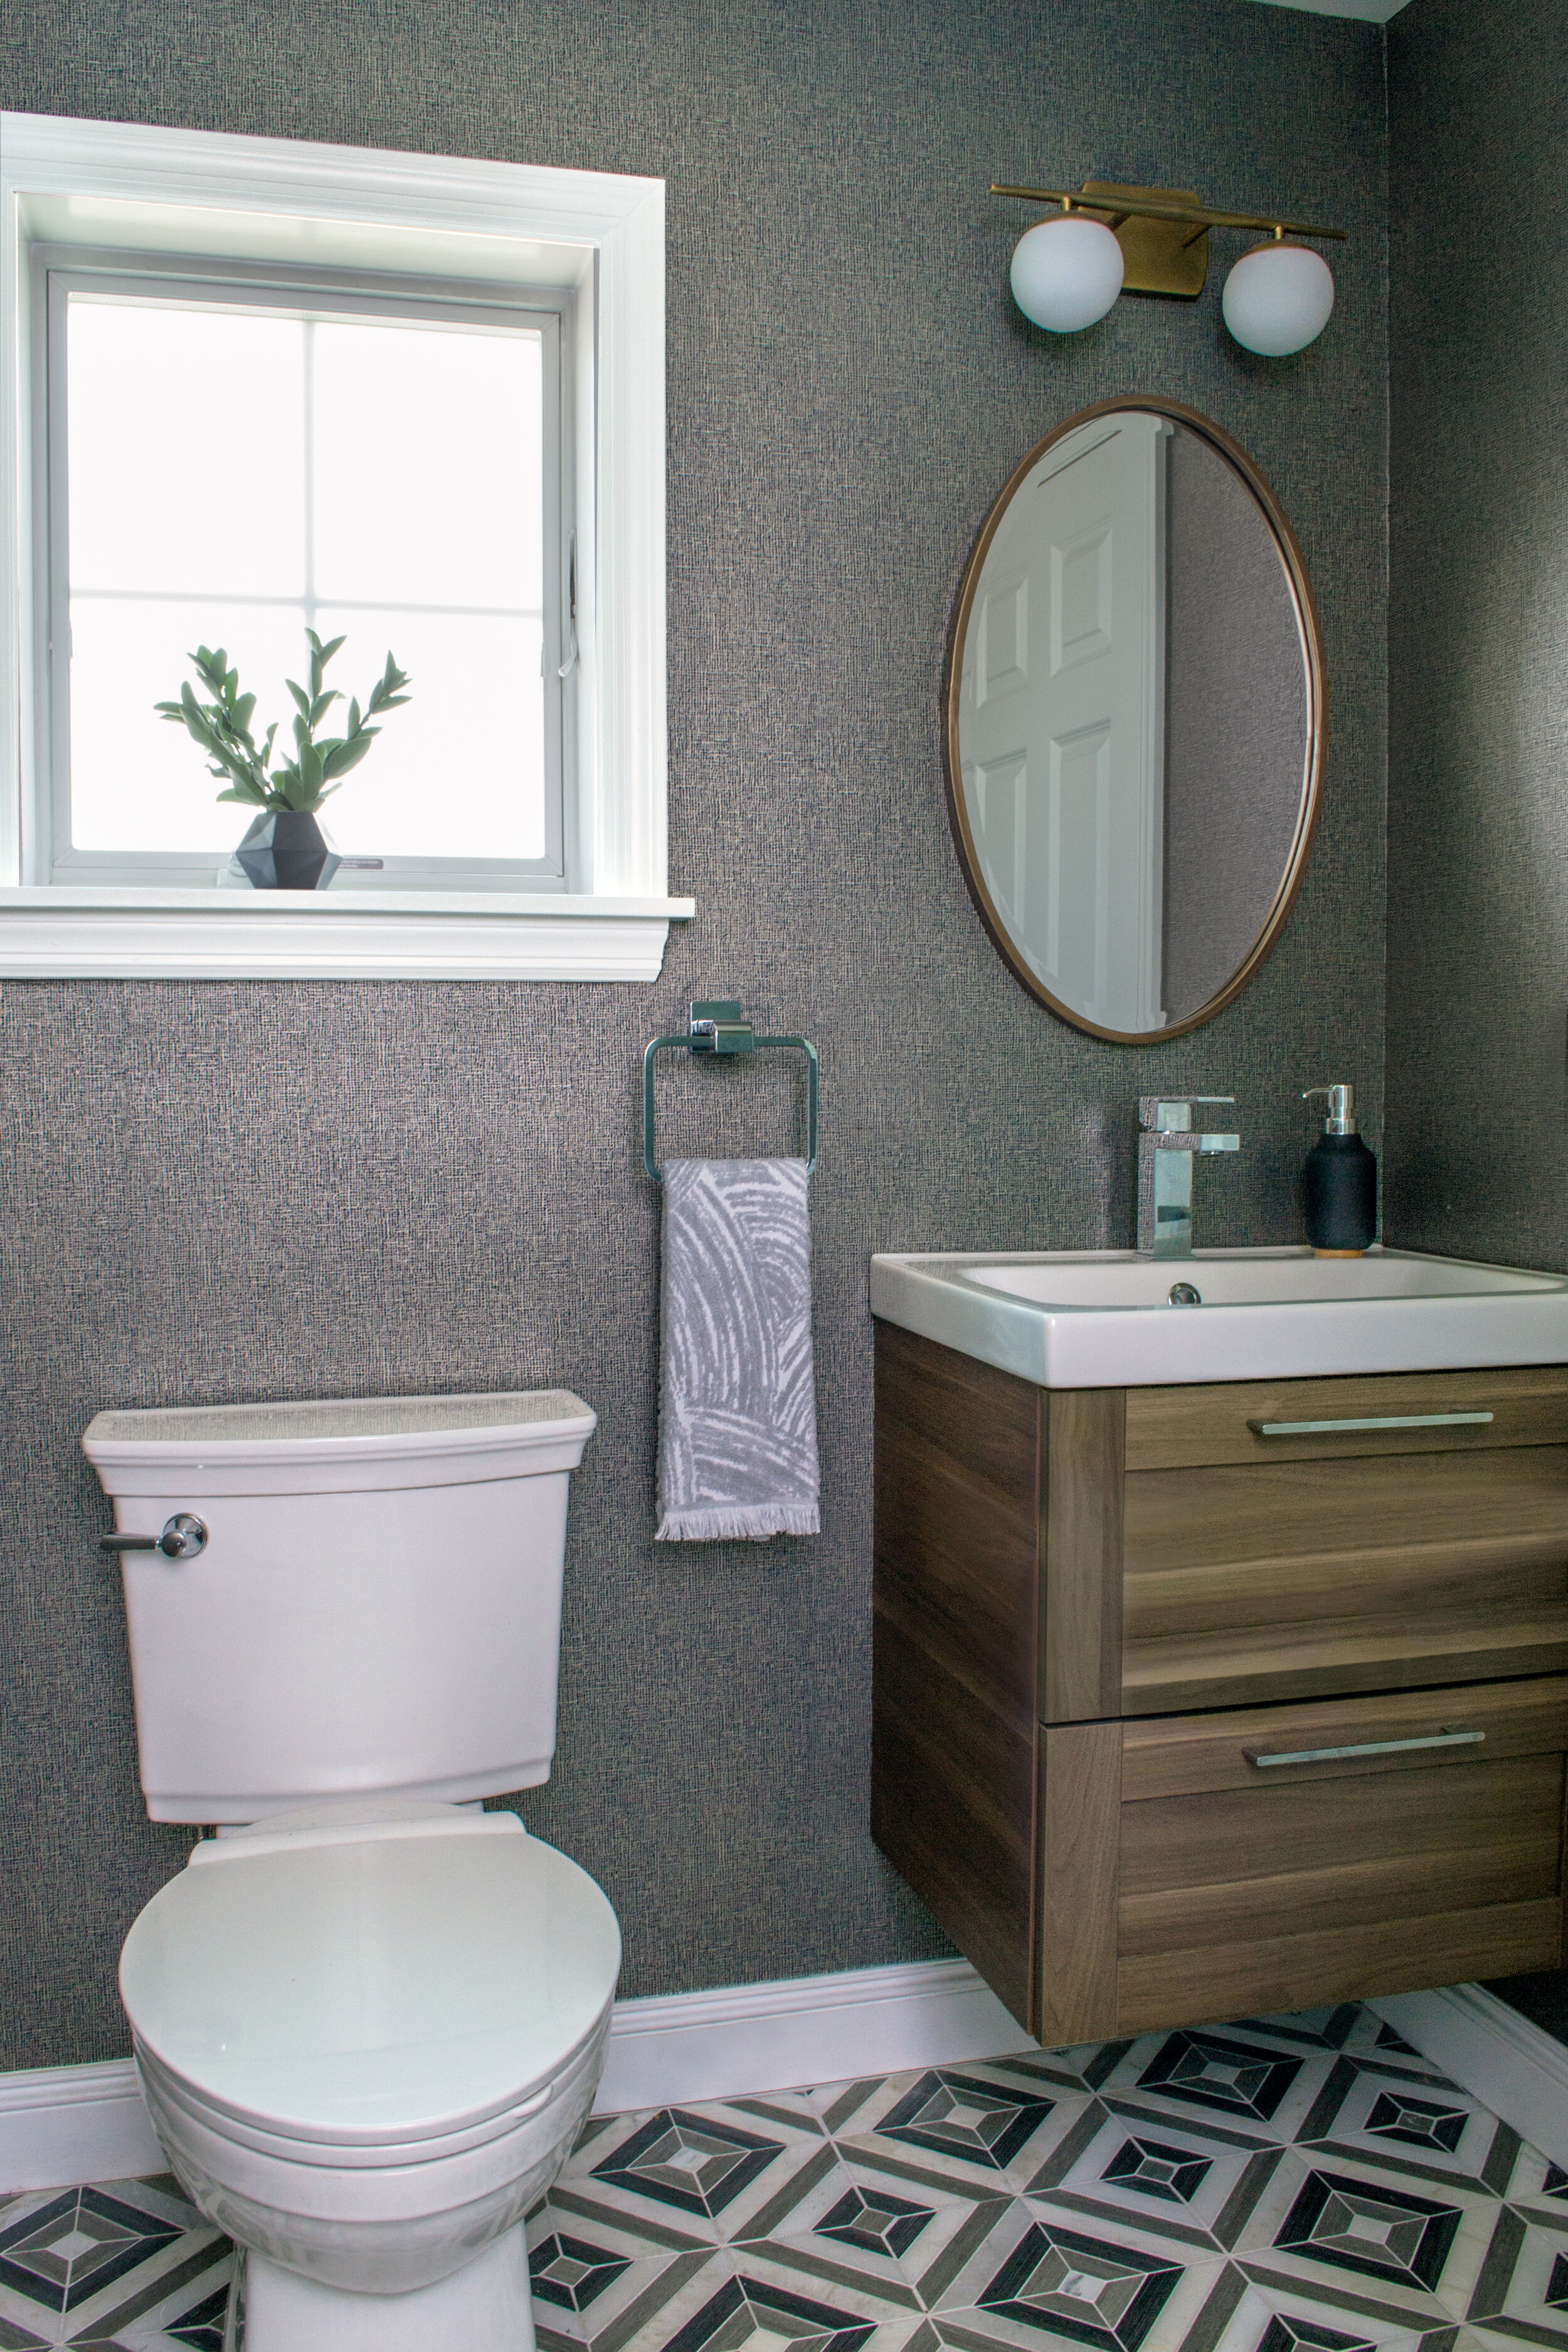 powder-room-dramatic-tc-interiors-1.jpg